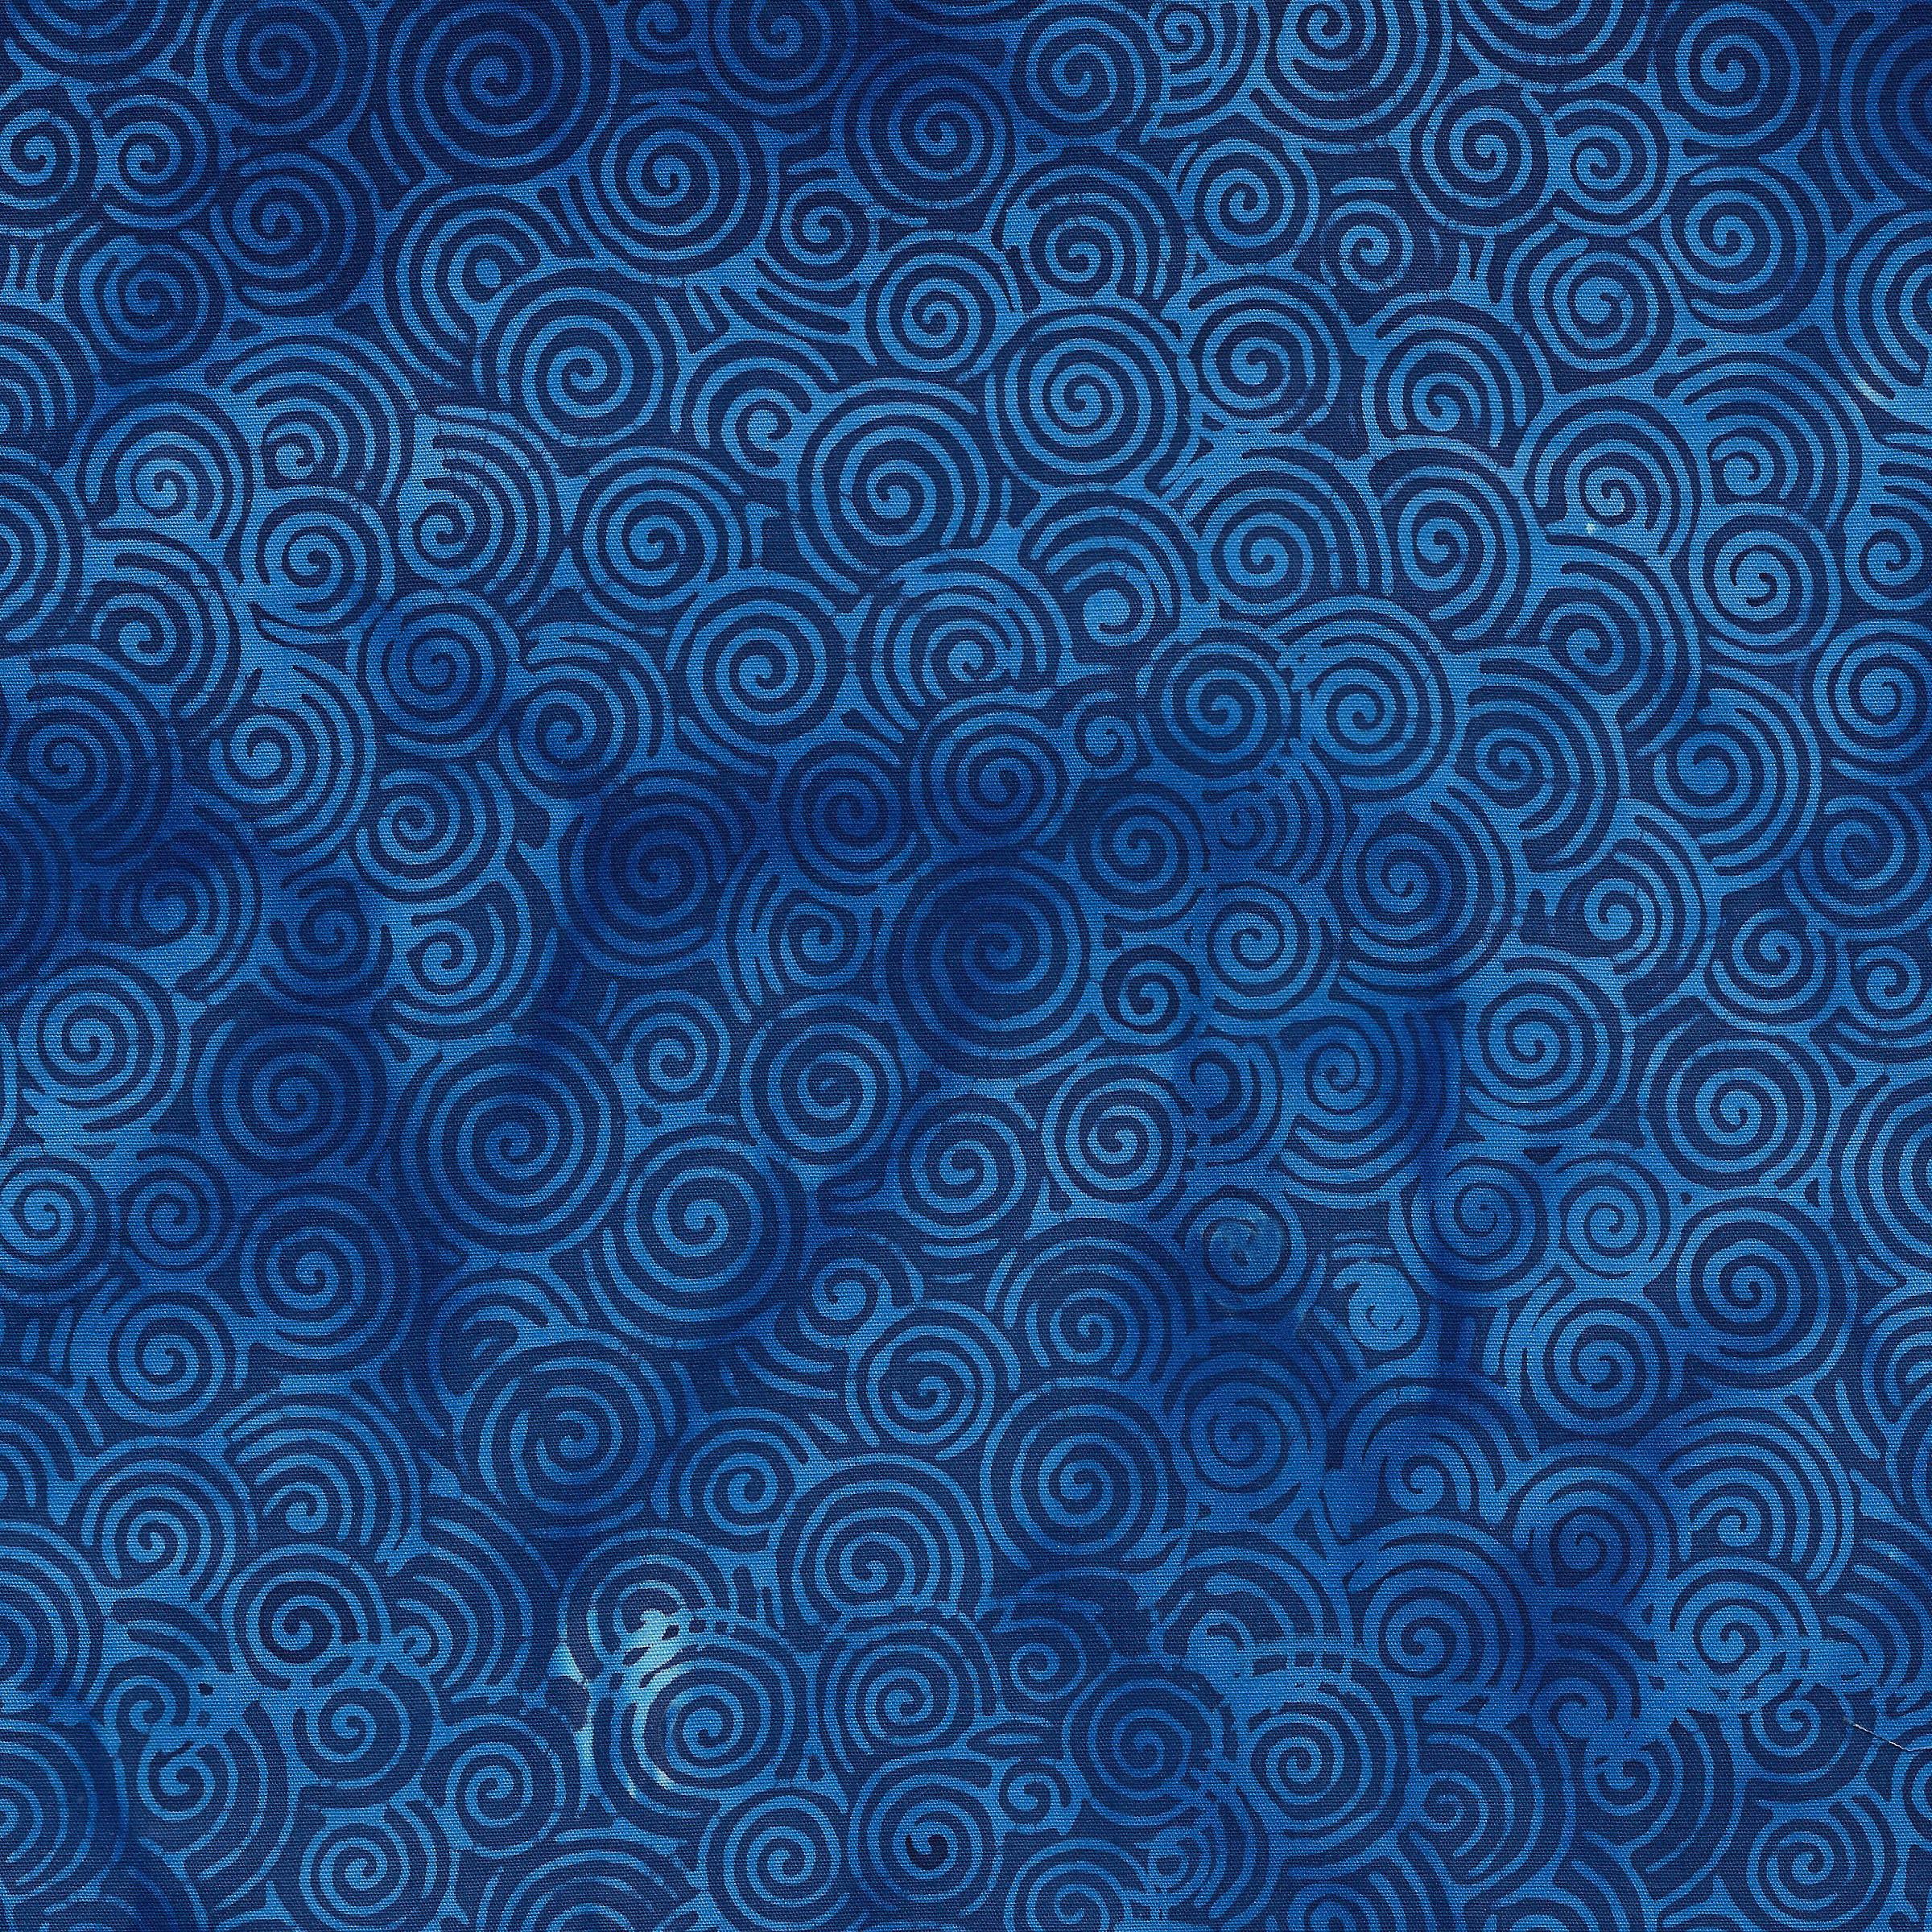 111908532 Swirls Royal Blue Sea